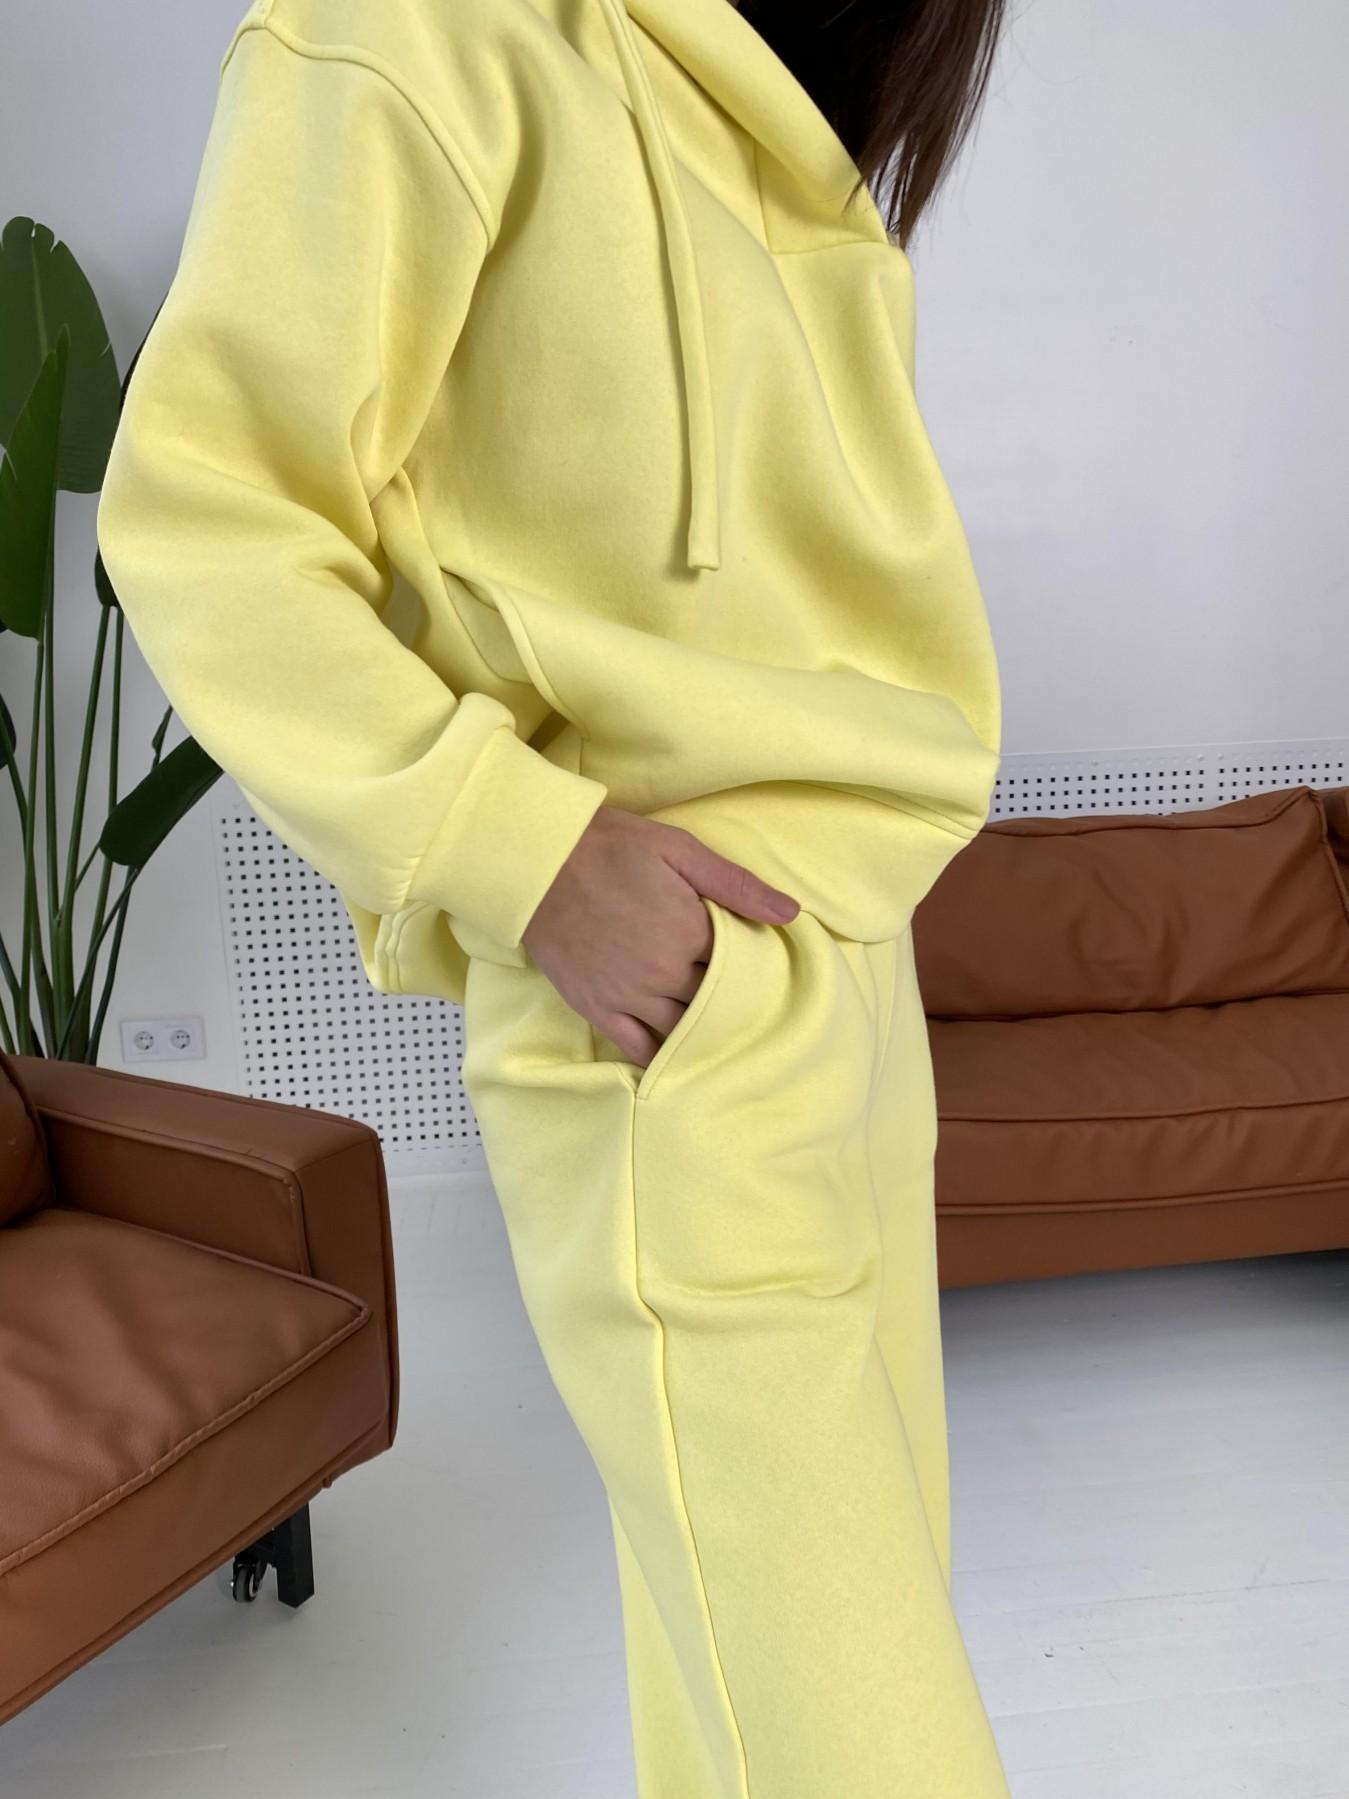 Ярис костюм из 3х нитки 10789 АРТ. 47259 Цвет: Лимон - фото 6, интернет магазин tm-modus.ru